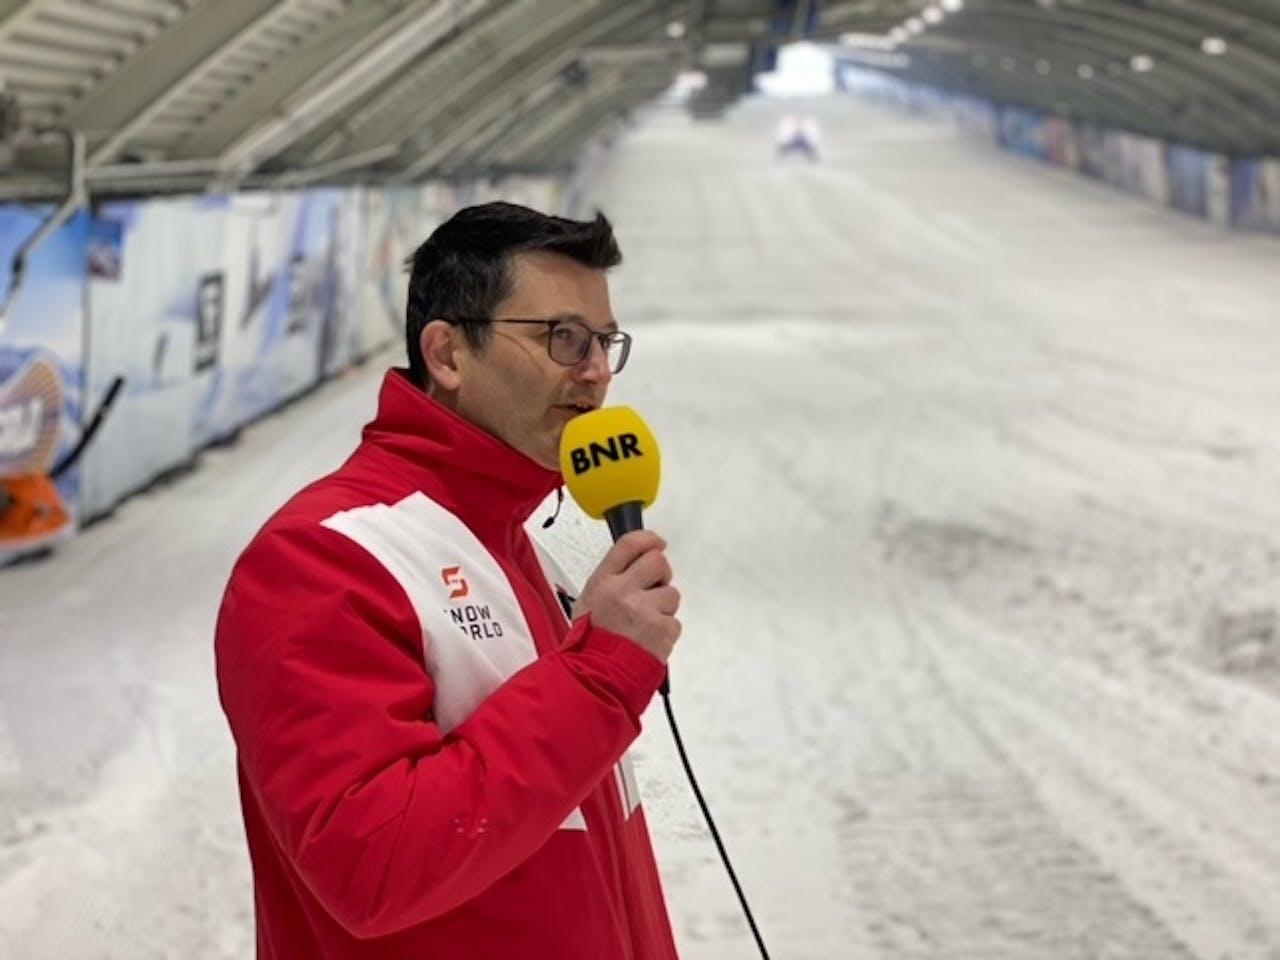 Wim Hubrechtsen, CEO van Snowworld